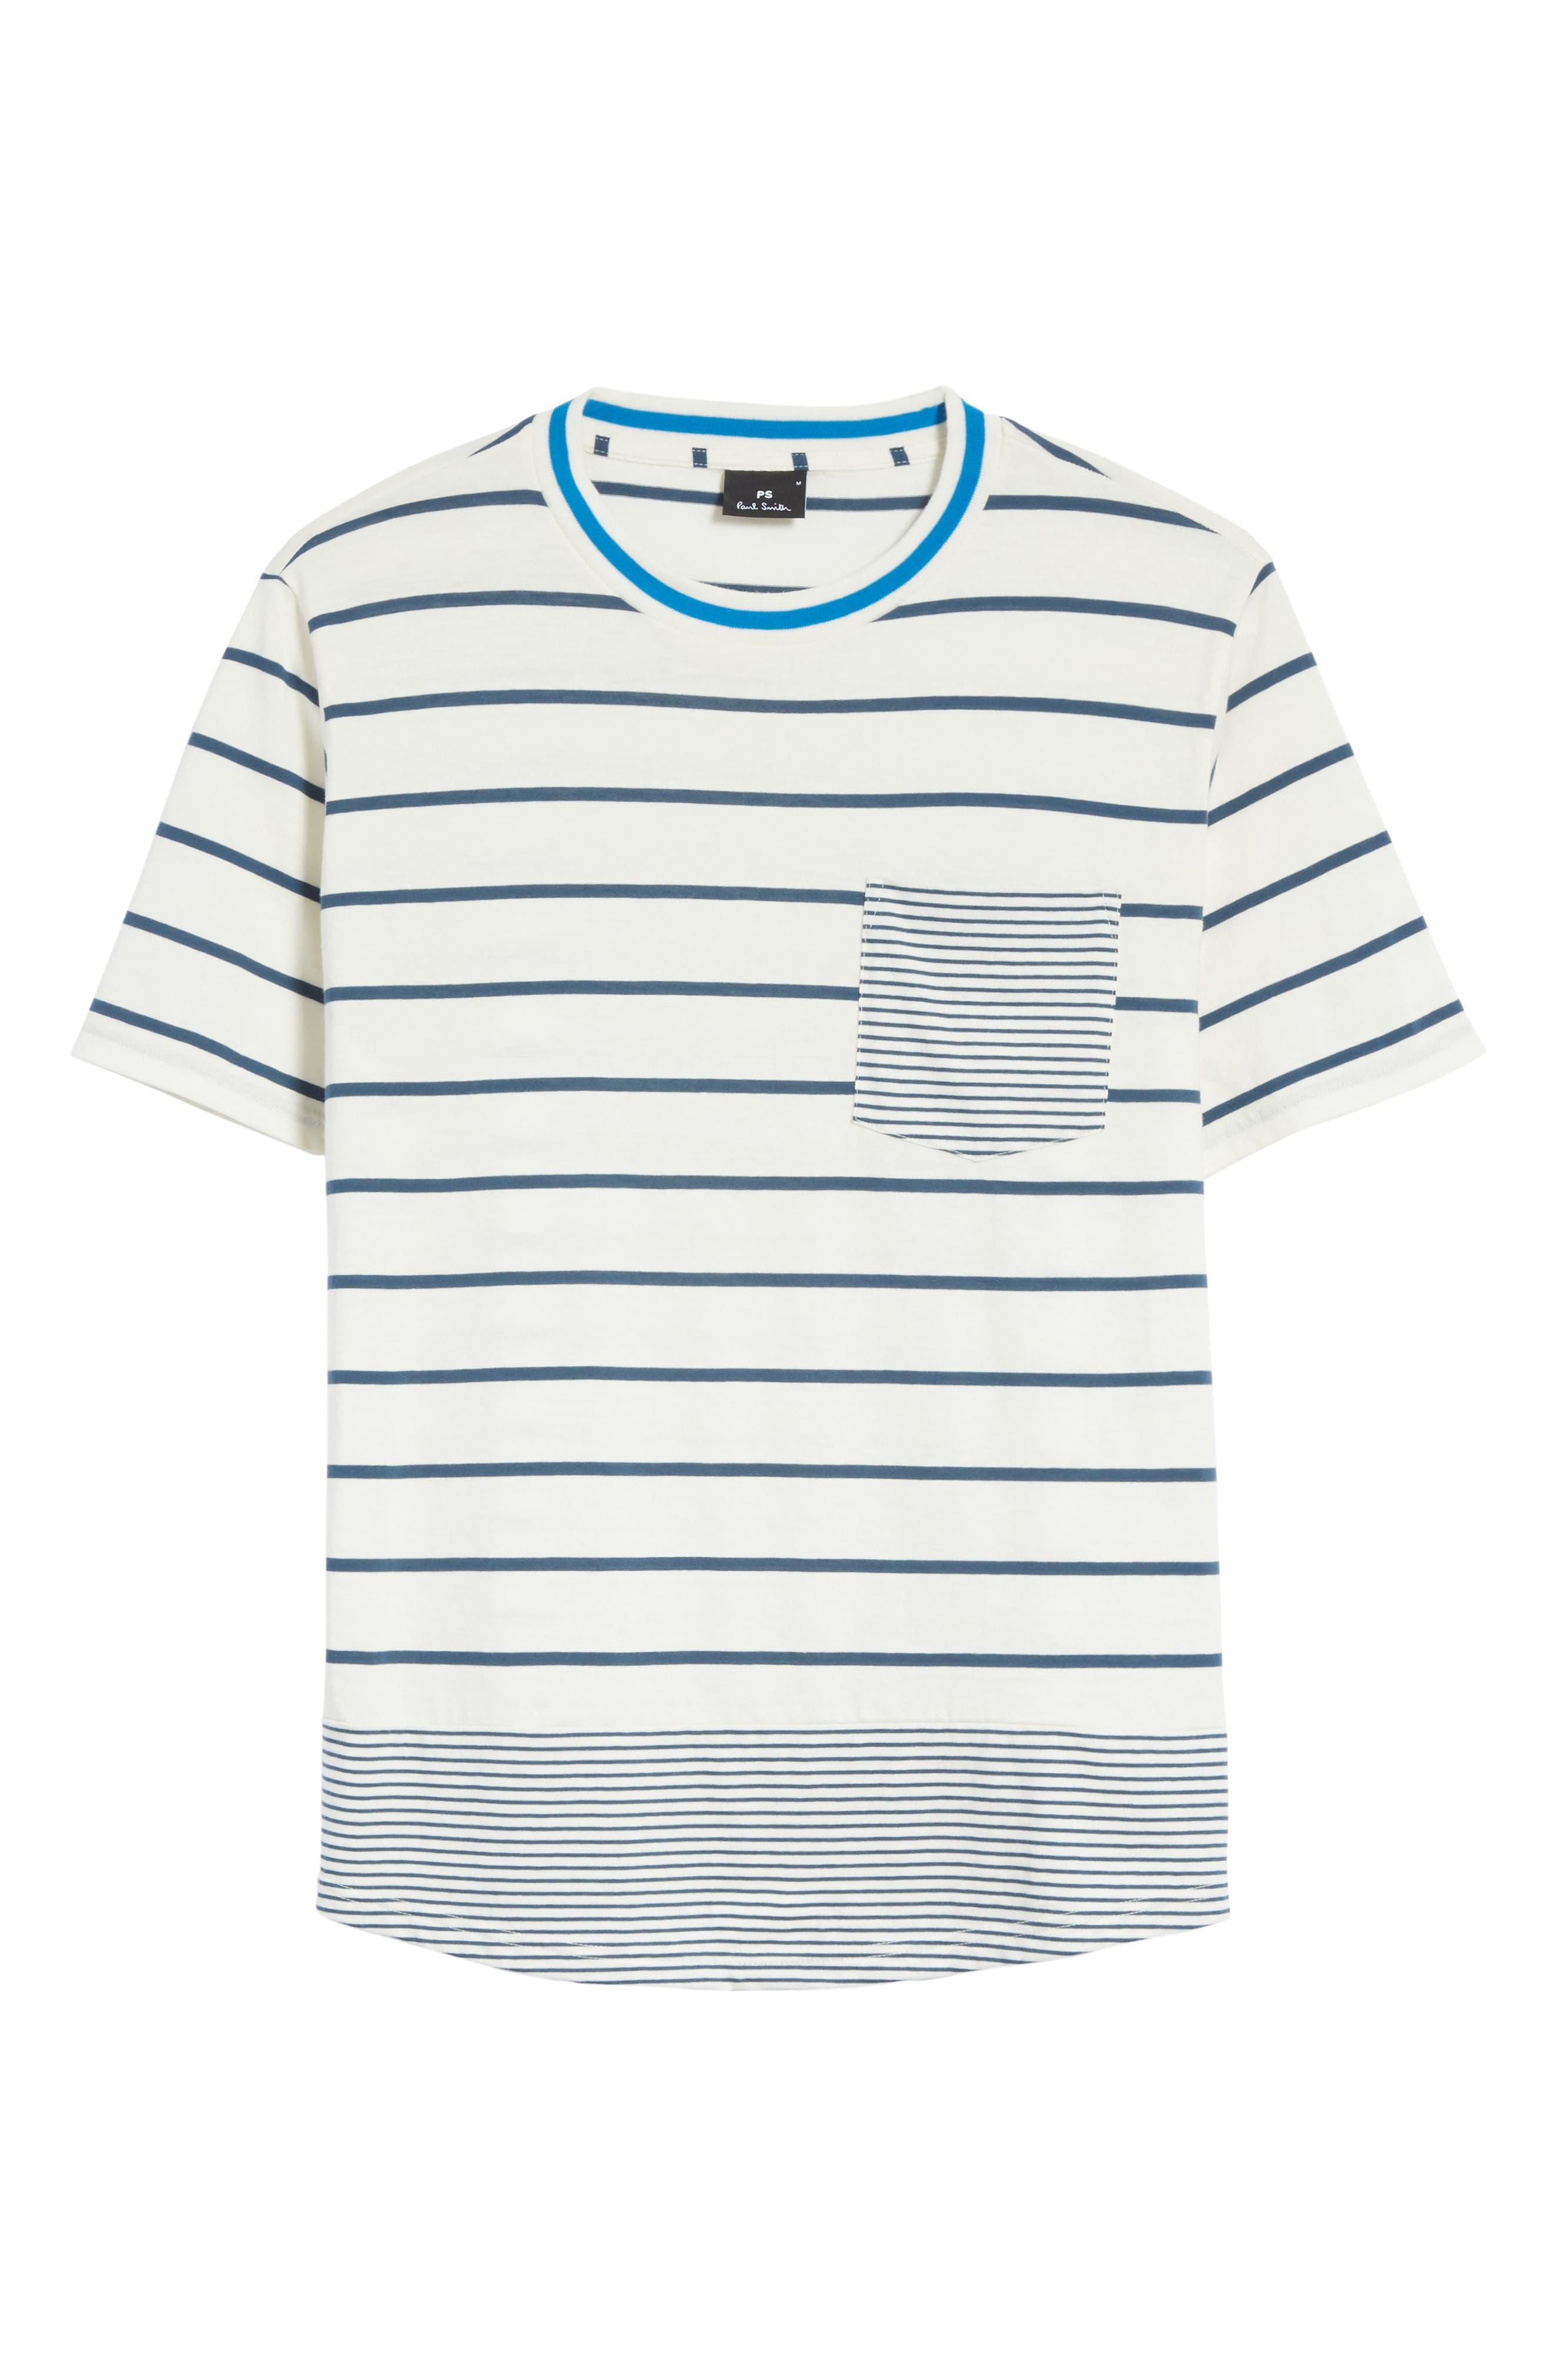 Mixed Stripe Pocket T-Shirt,                             Alternate thumbnail 6, color,                             435